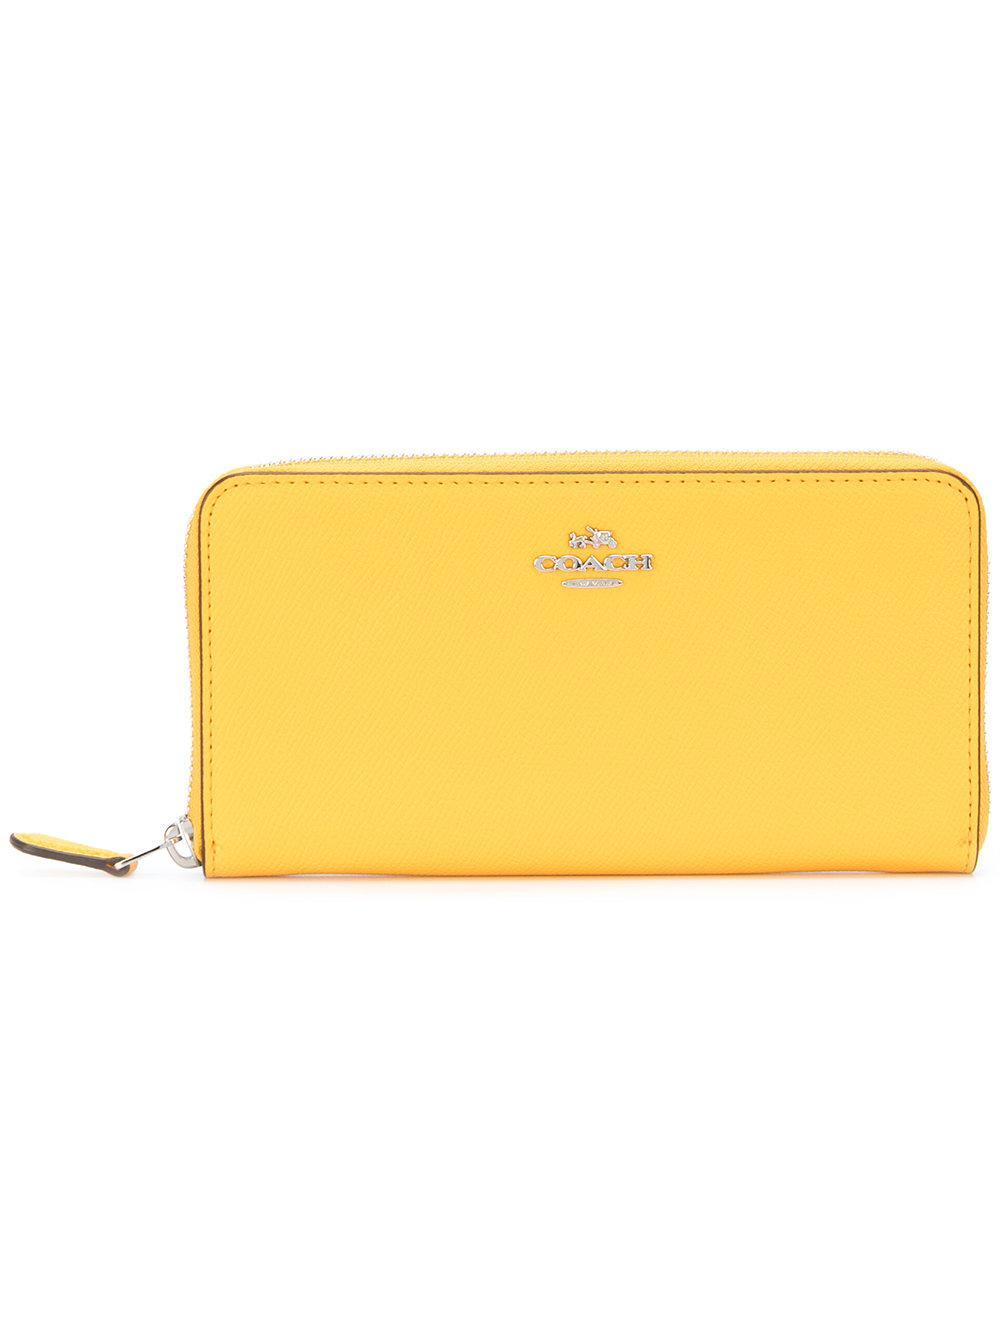 ed43cffbb6 COACH Accordion Zip Wallet in Yellow - Lyst